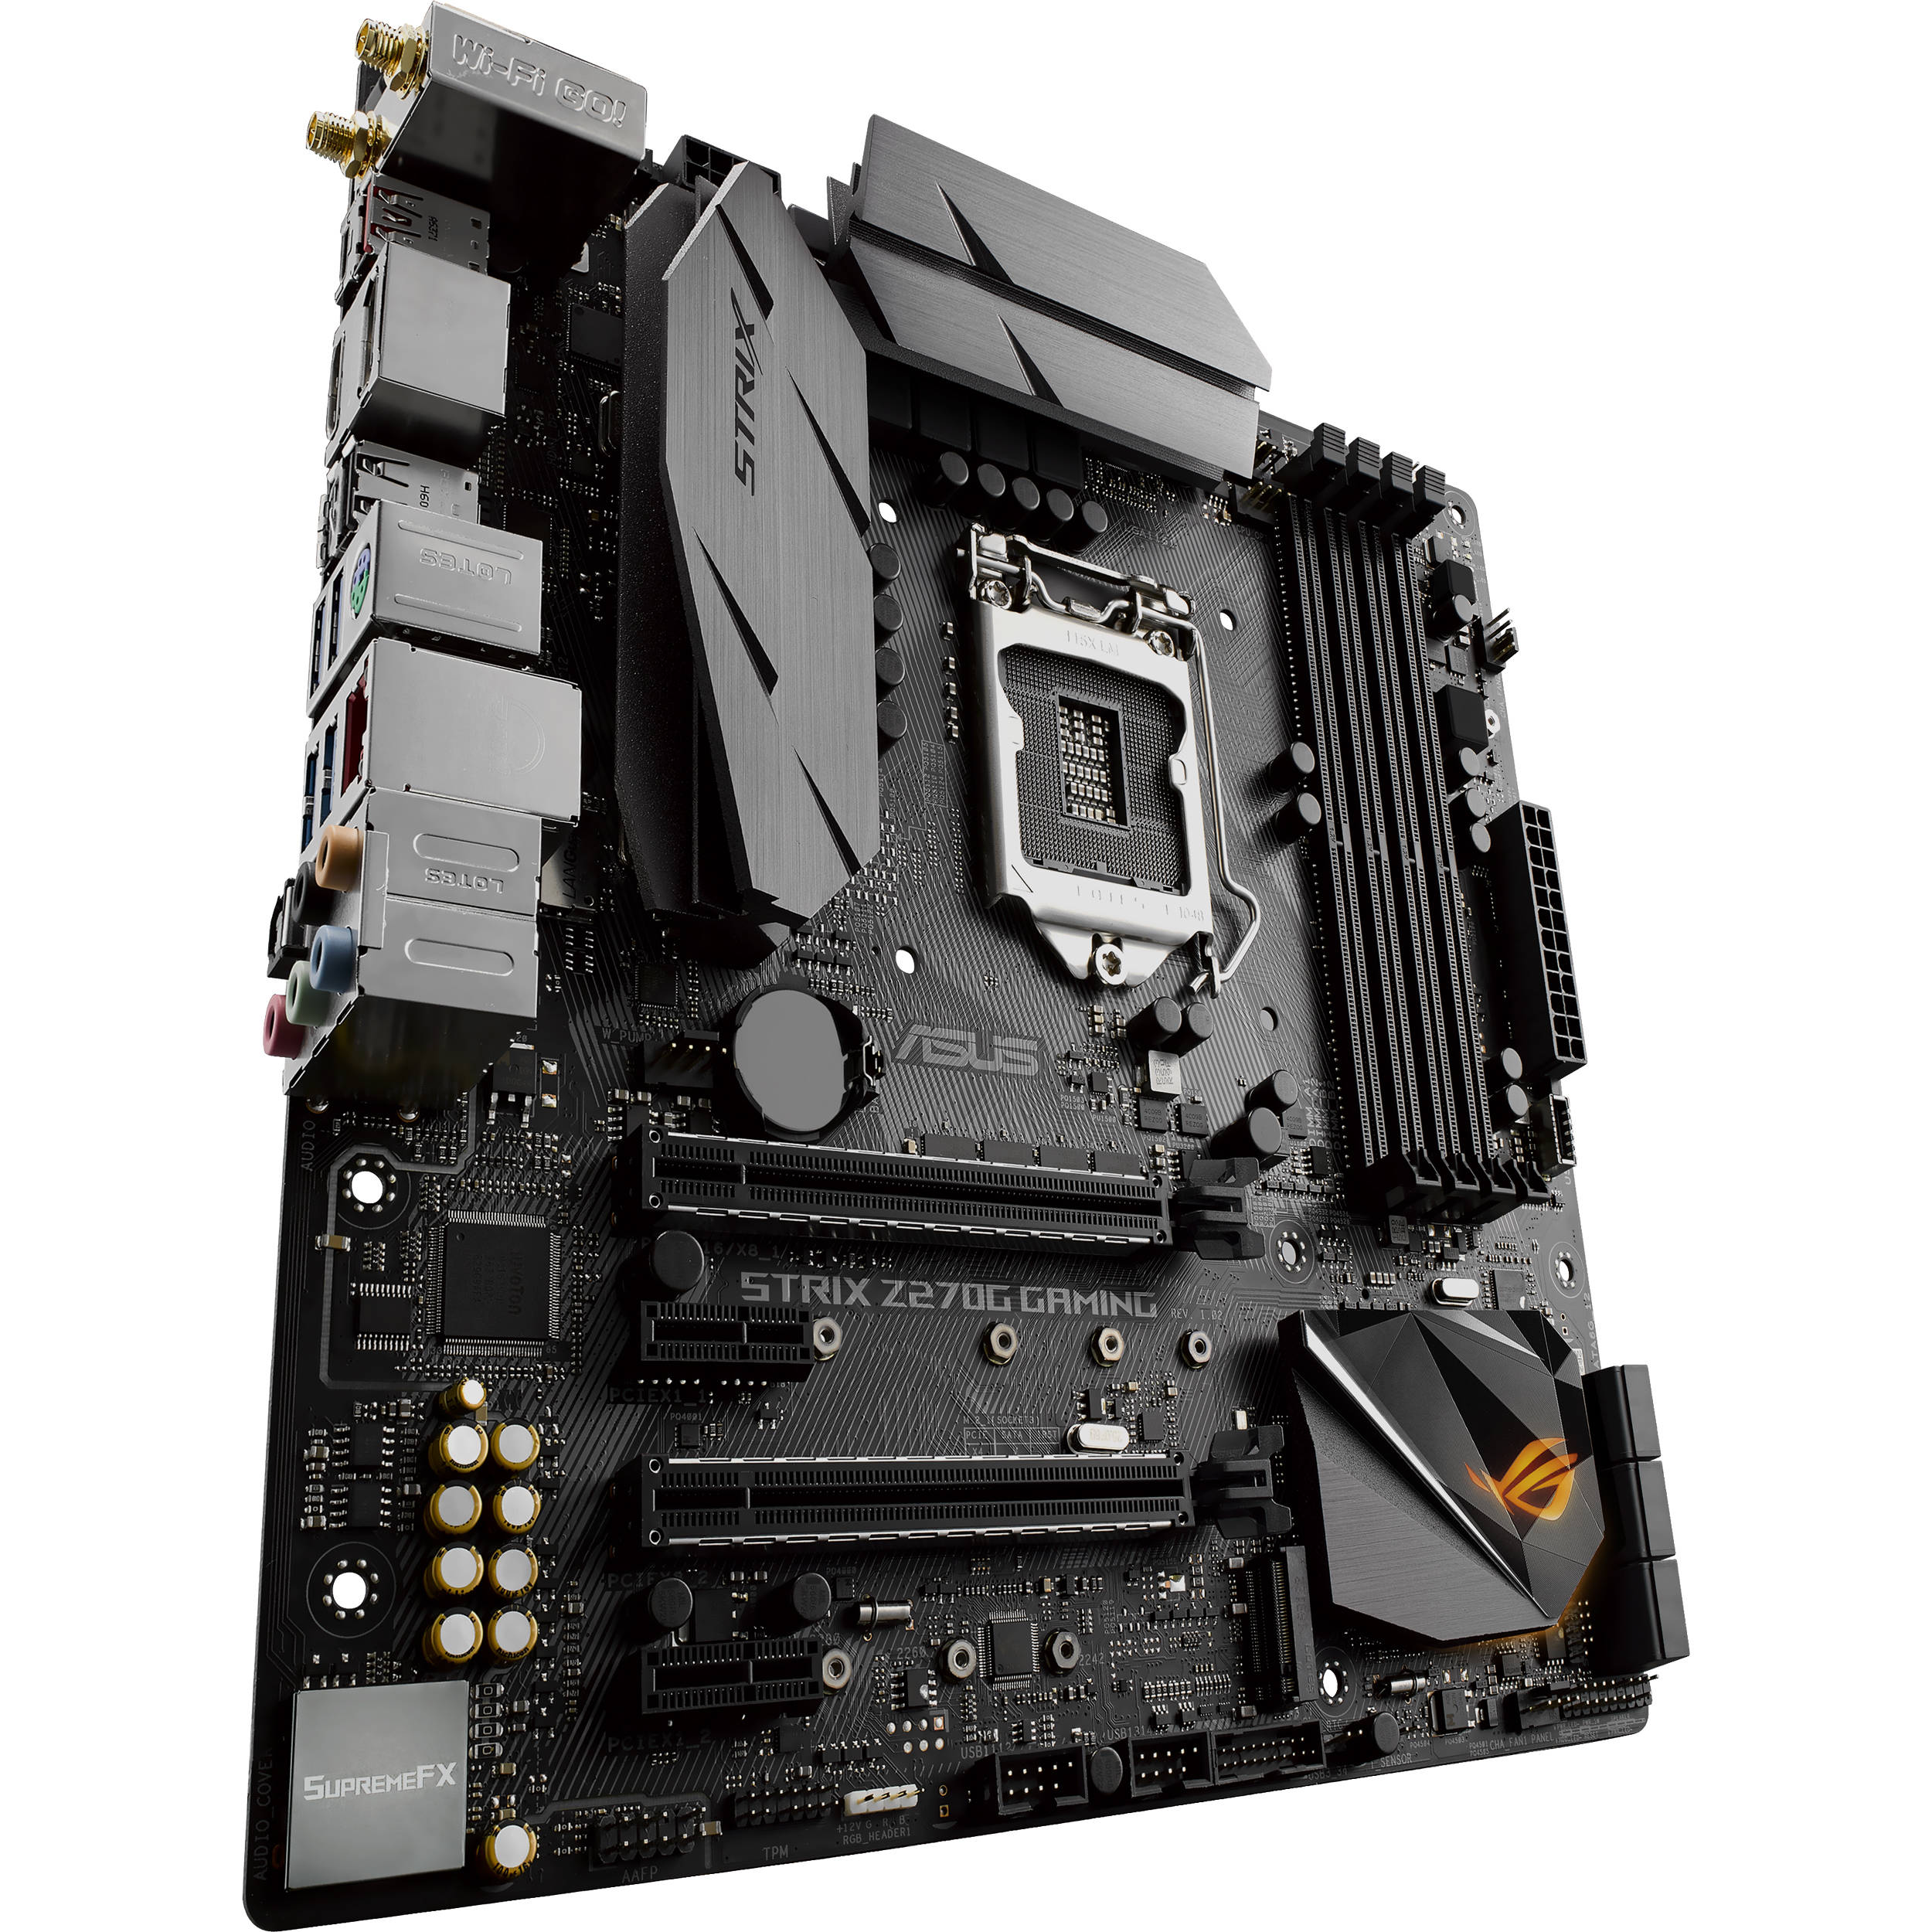 ASUS Republic of Gamers Strix Z270G Gaming LGA 1151 Micro-ATX Motherboard